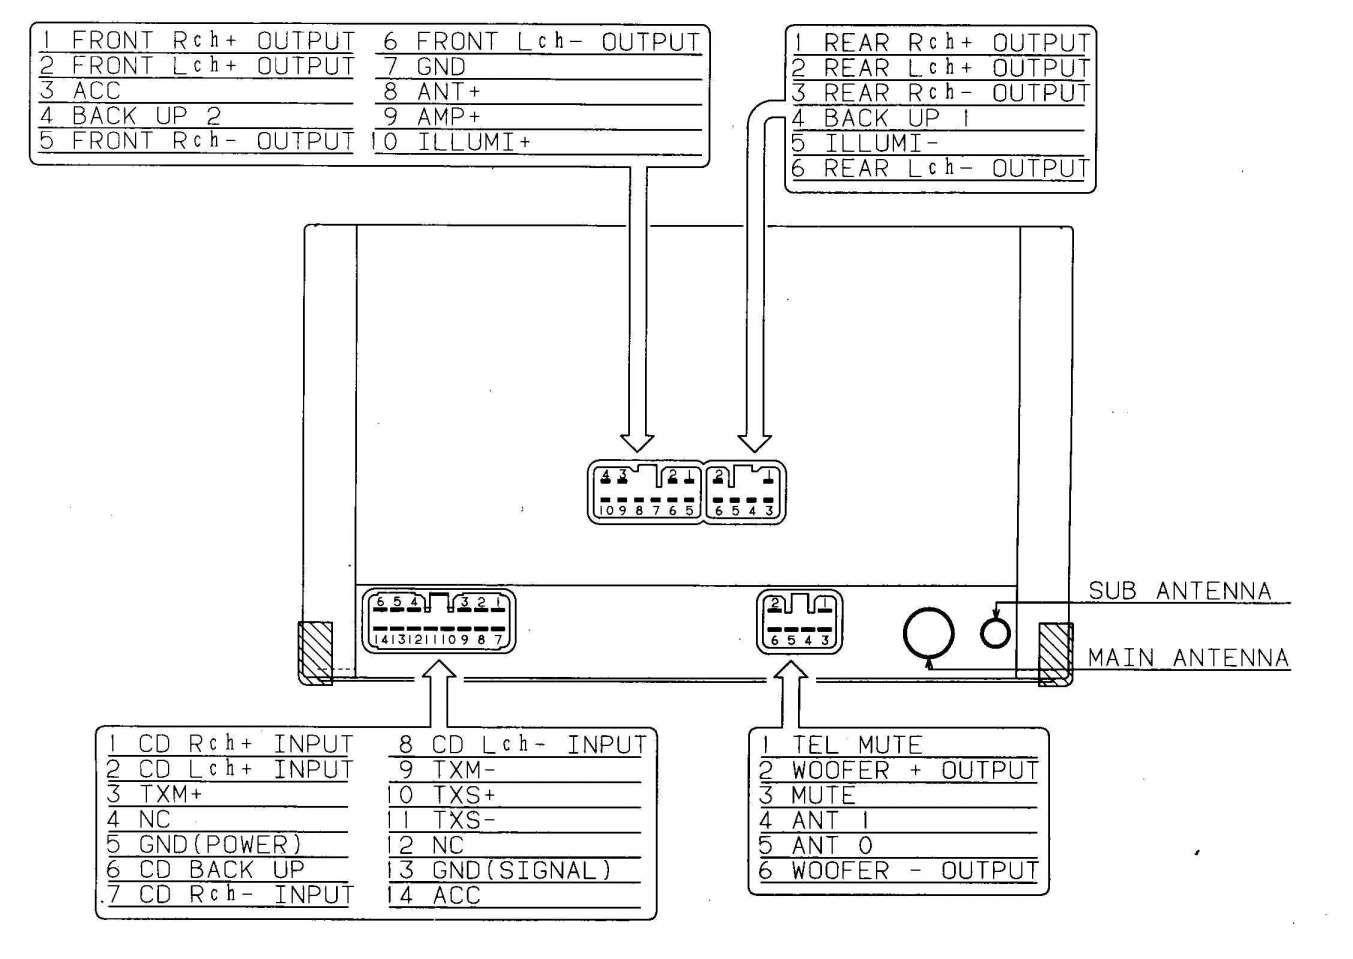 1994 lexus gs300 wiring diagram lexus es300 wiring diagram stereo wiring diagram data  lexus es300 wiring diagram stereo